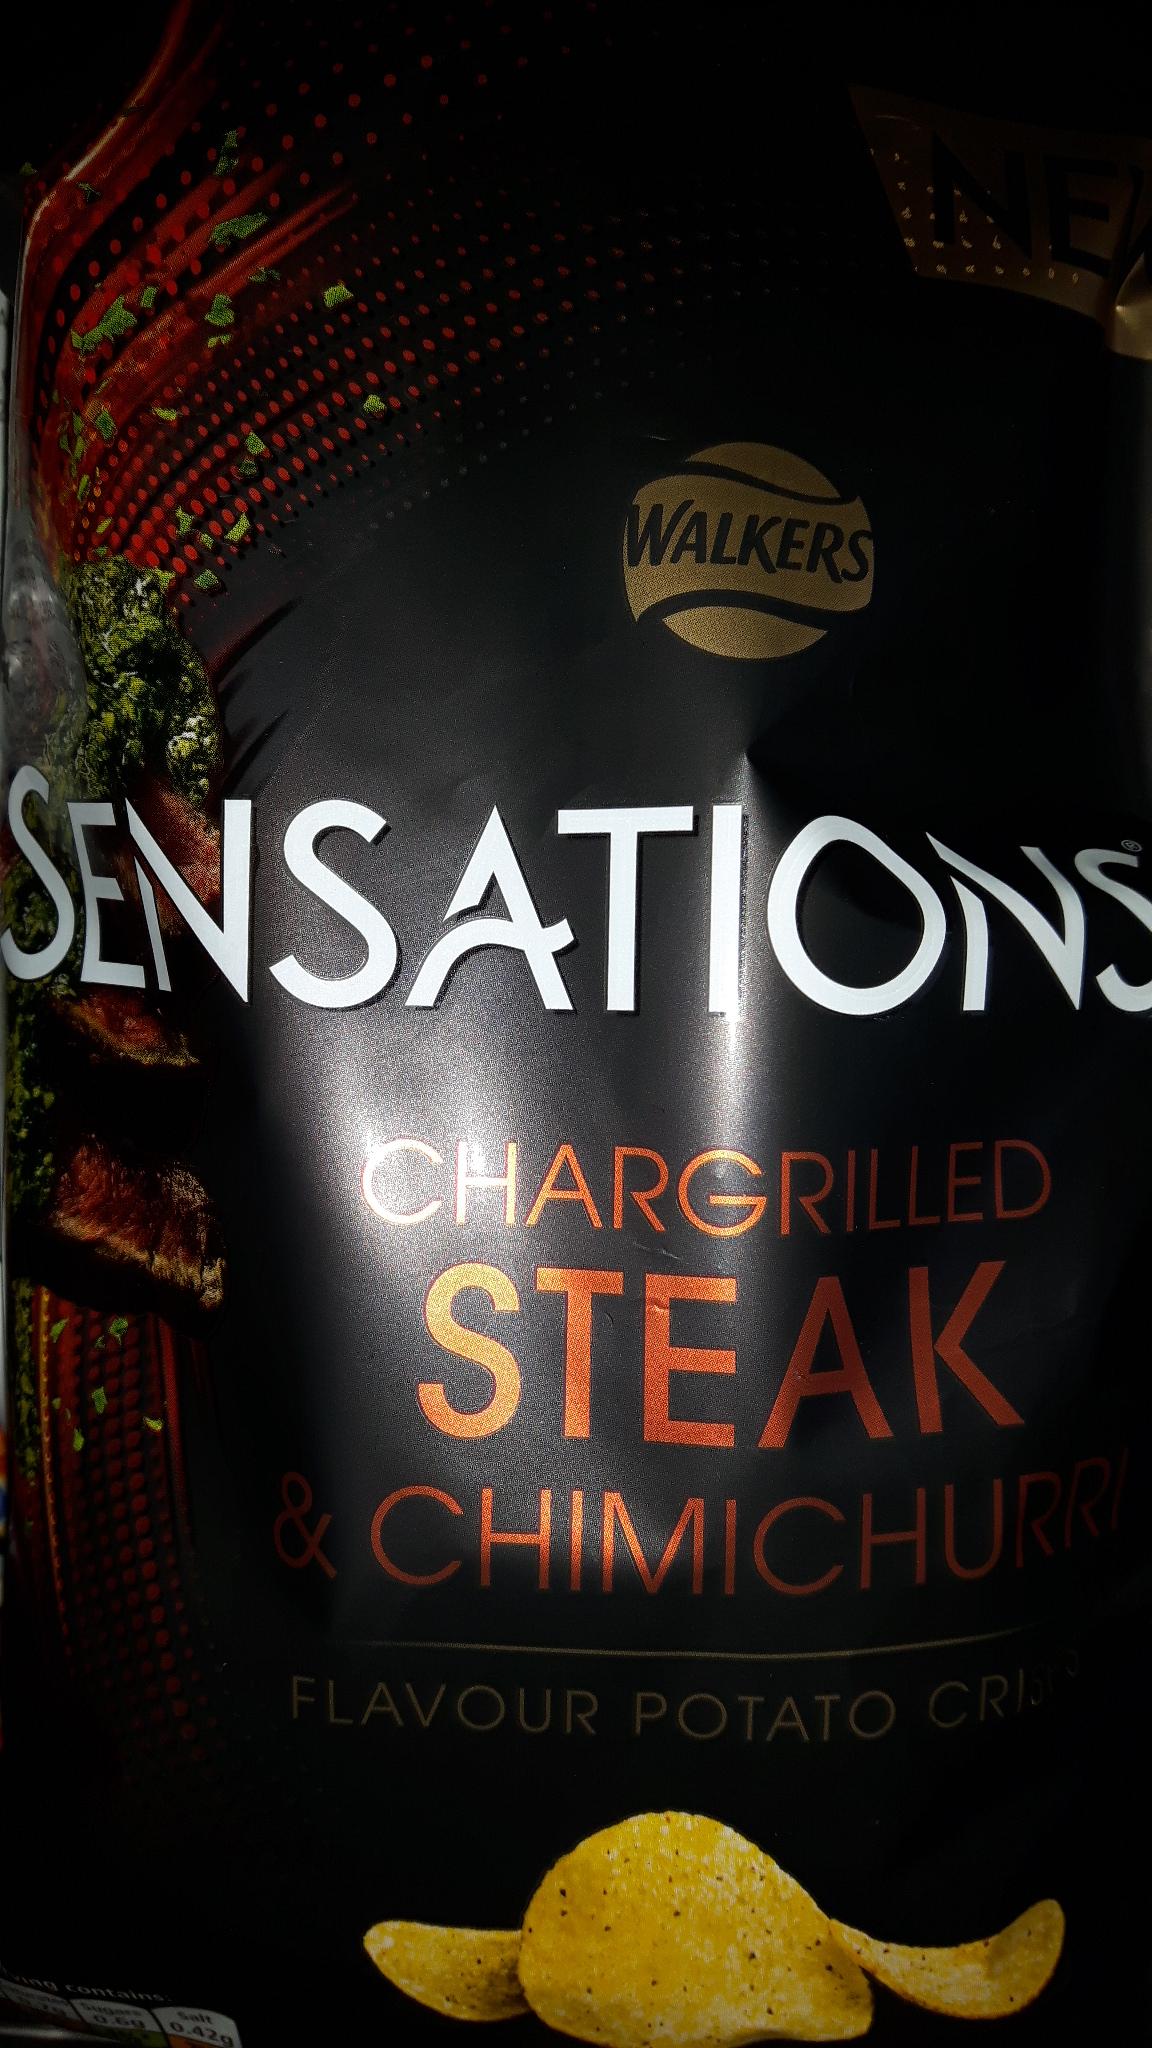 Walkers Sensations Chargrilled Steak & Chimichuri 150g 60p at Heron Foods